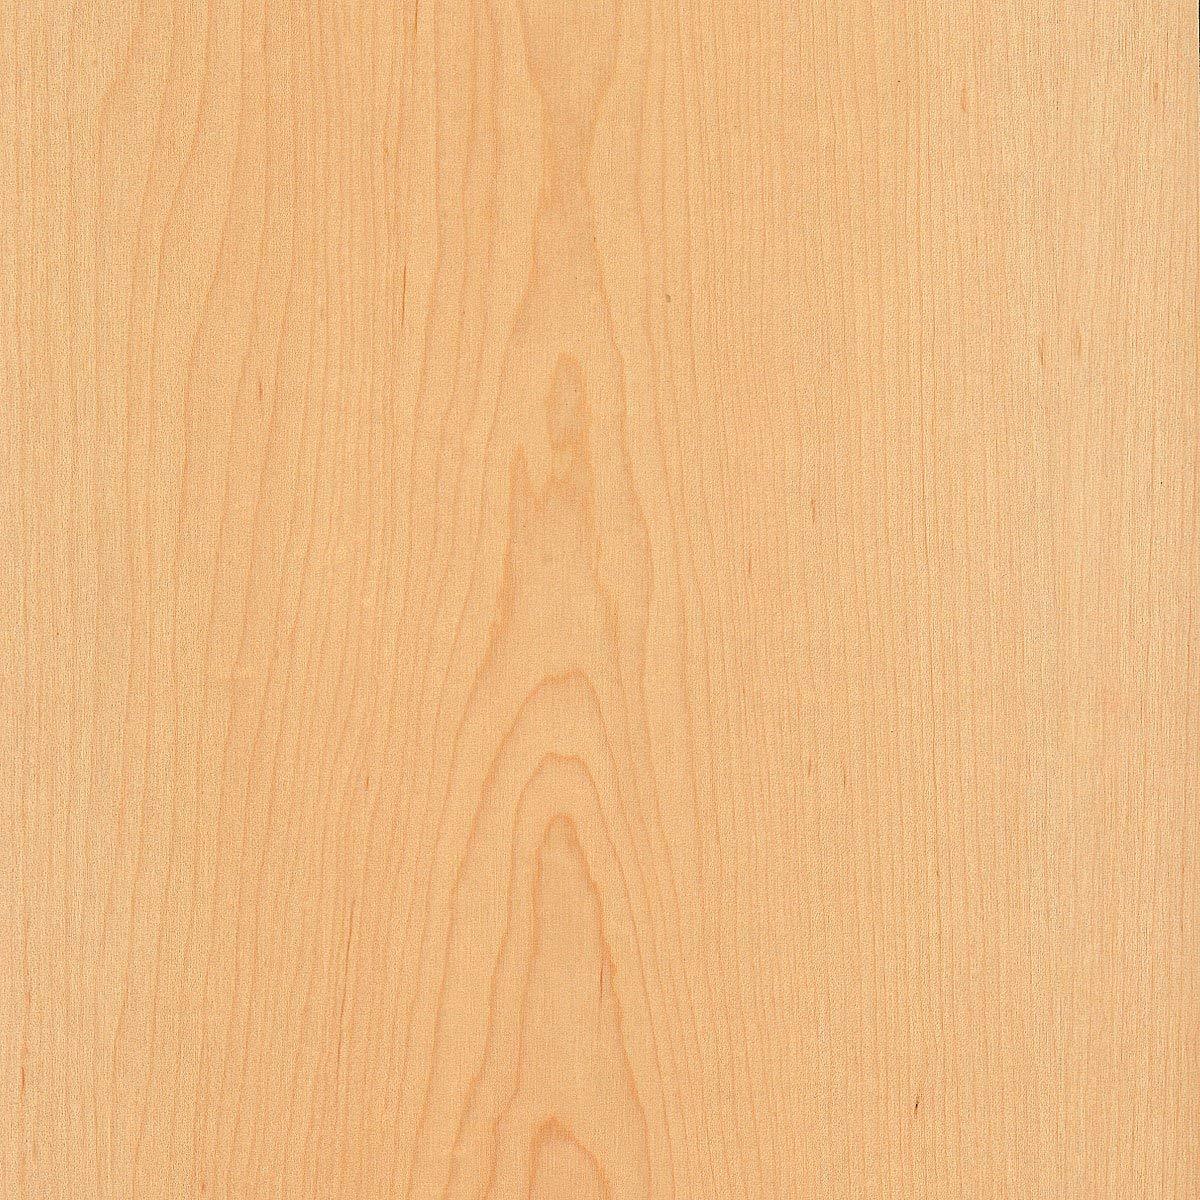 2440 x 1220 x 12mm Maple / Maple MDF